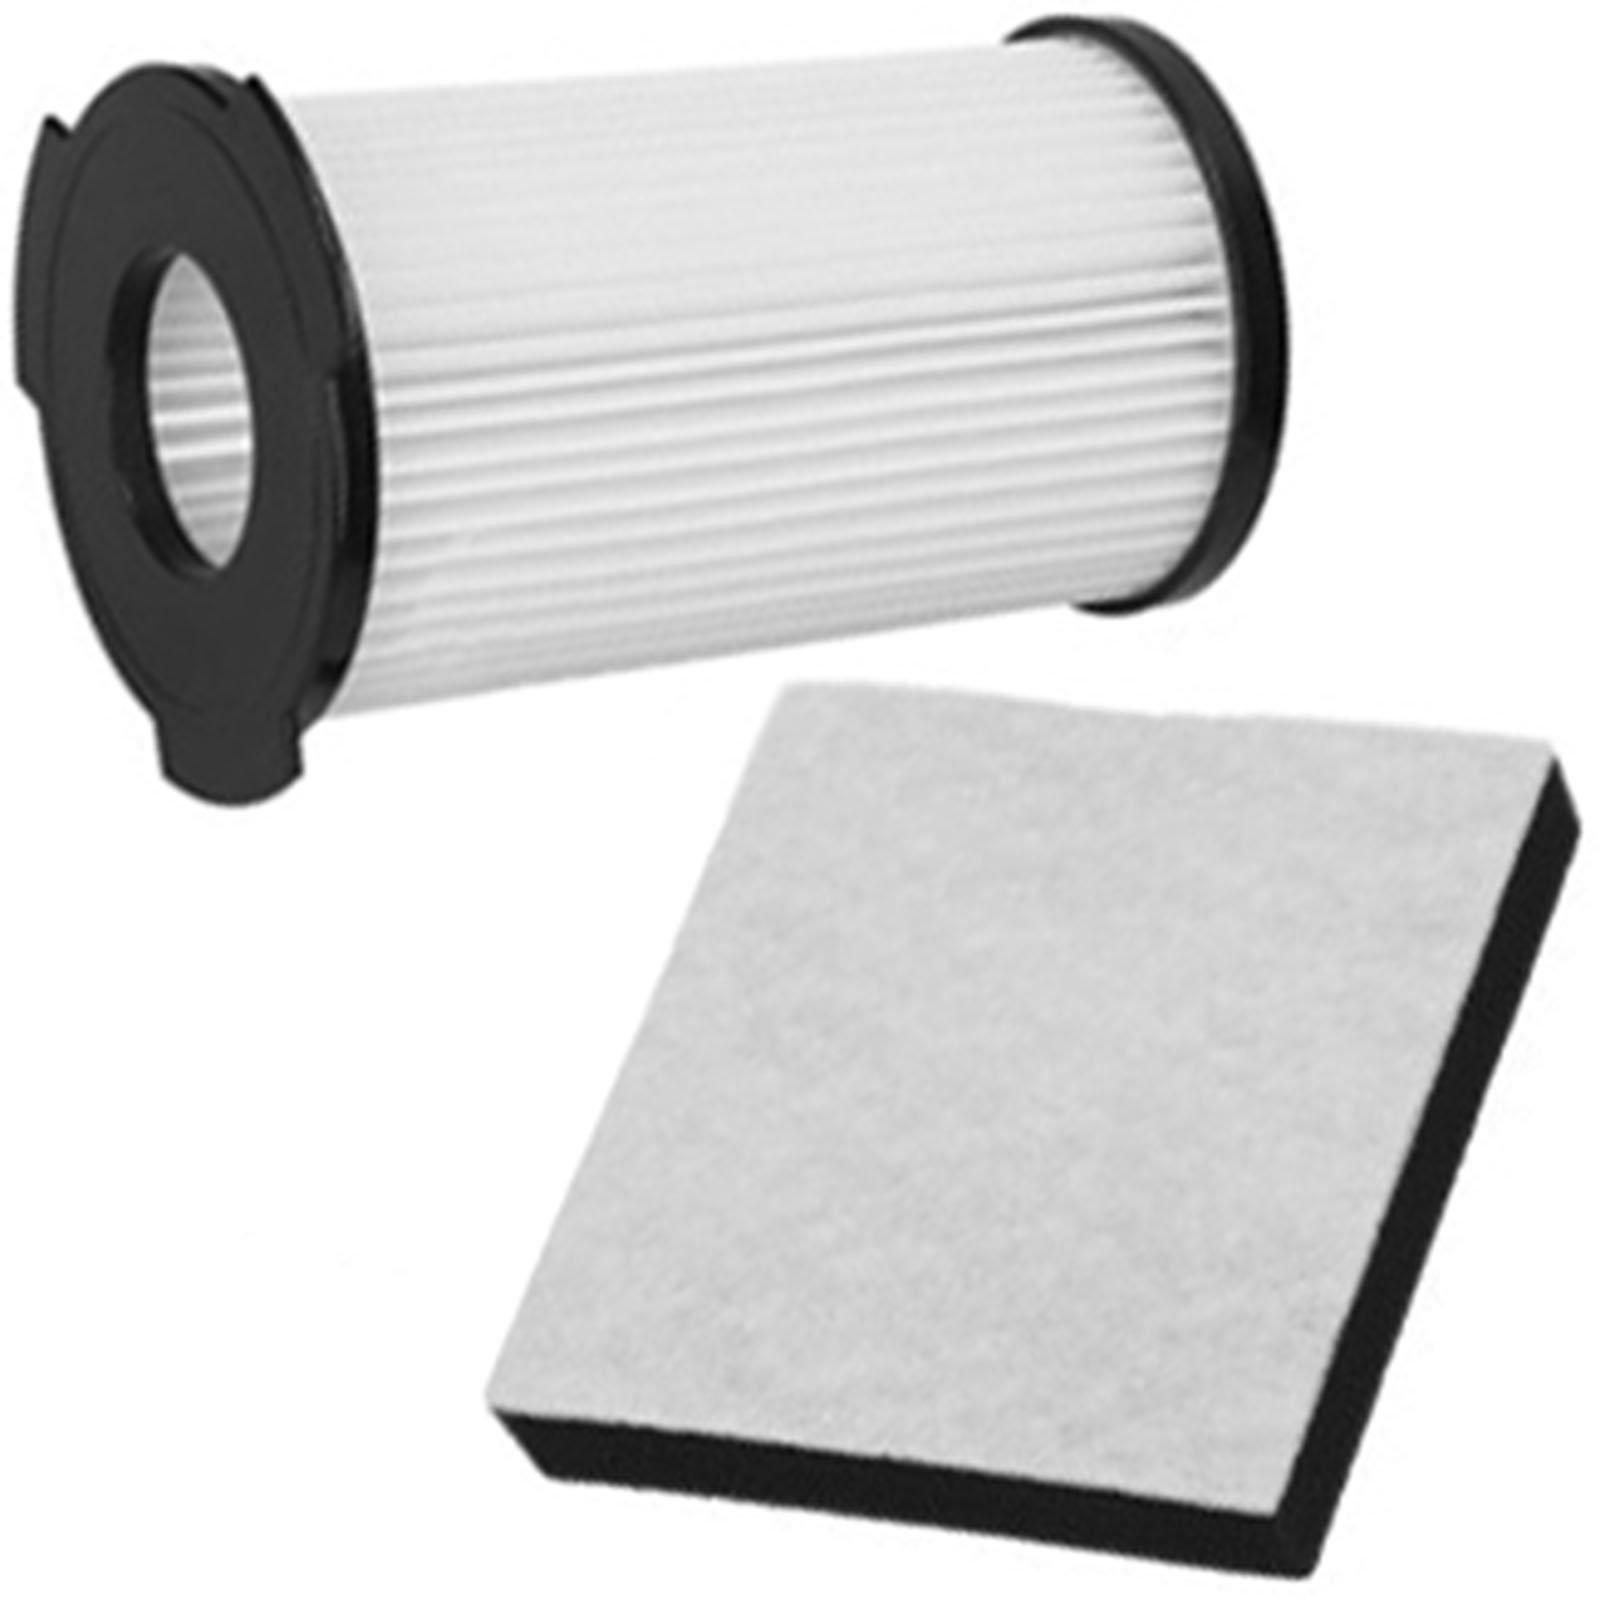 SPARES2GO Washable HEPA Media Filter Set for Vax Astrata Centrix Power Midi Vacuum Cleaner